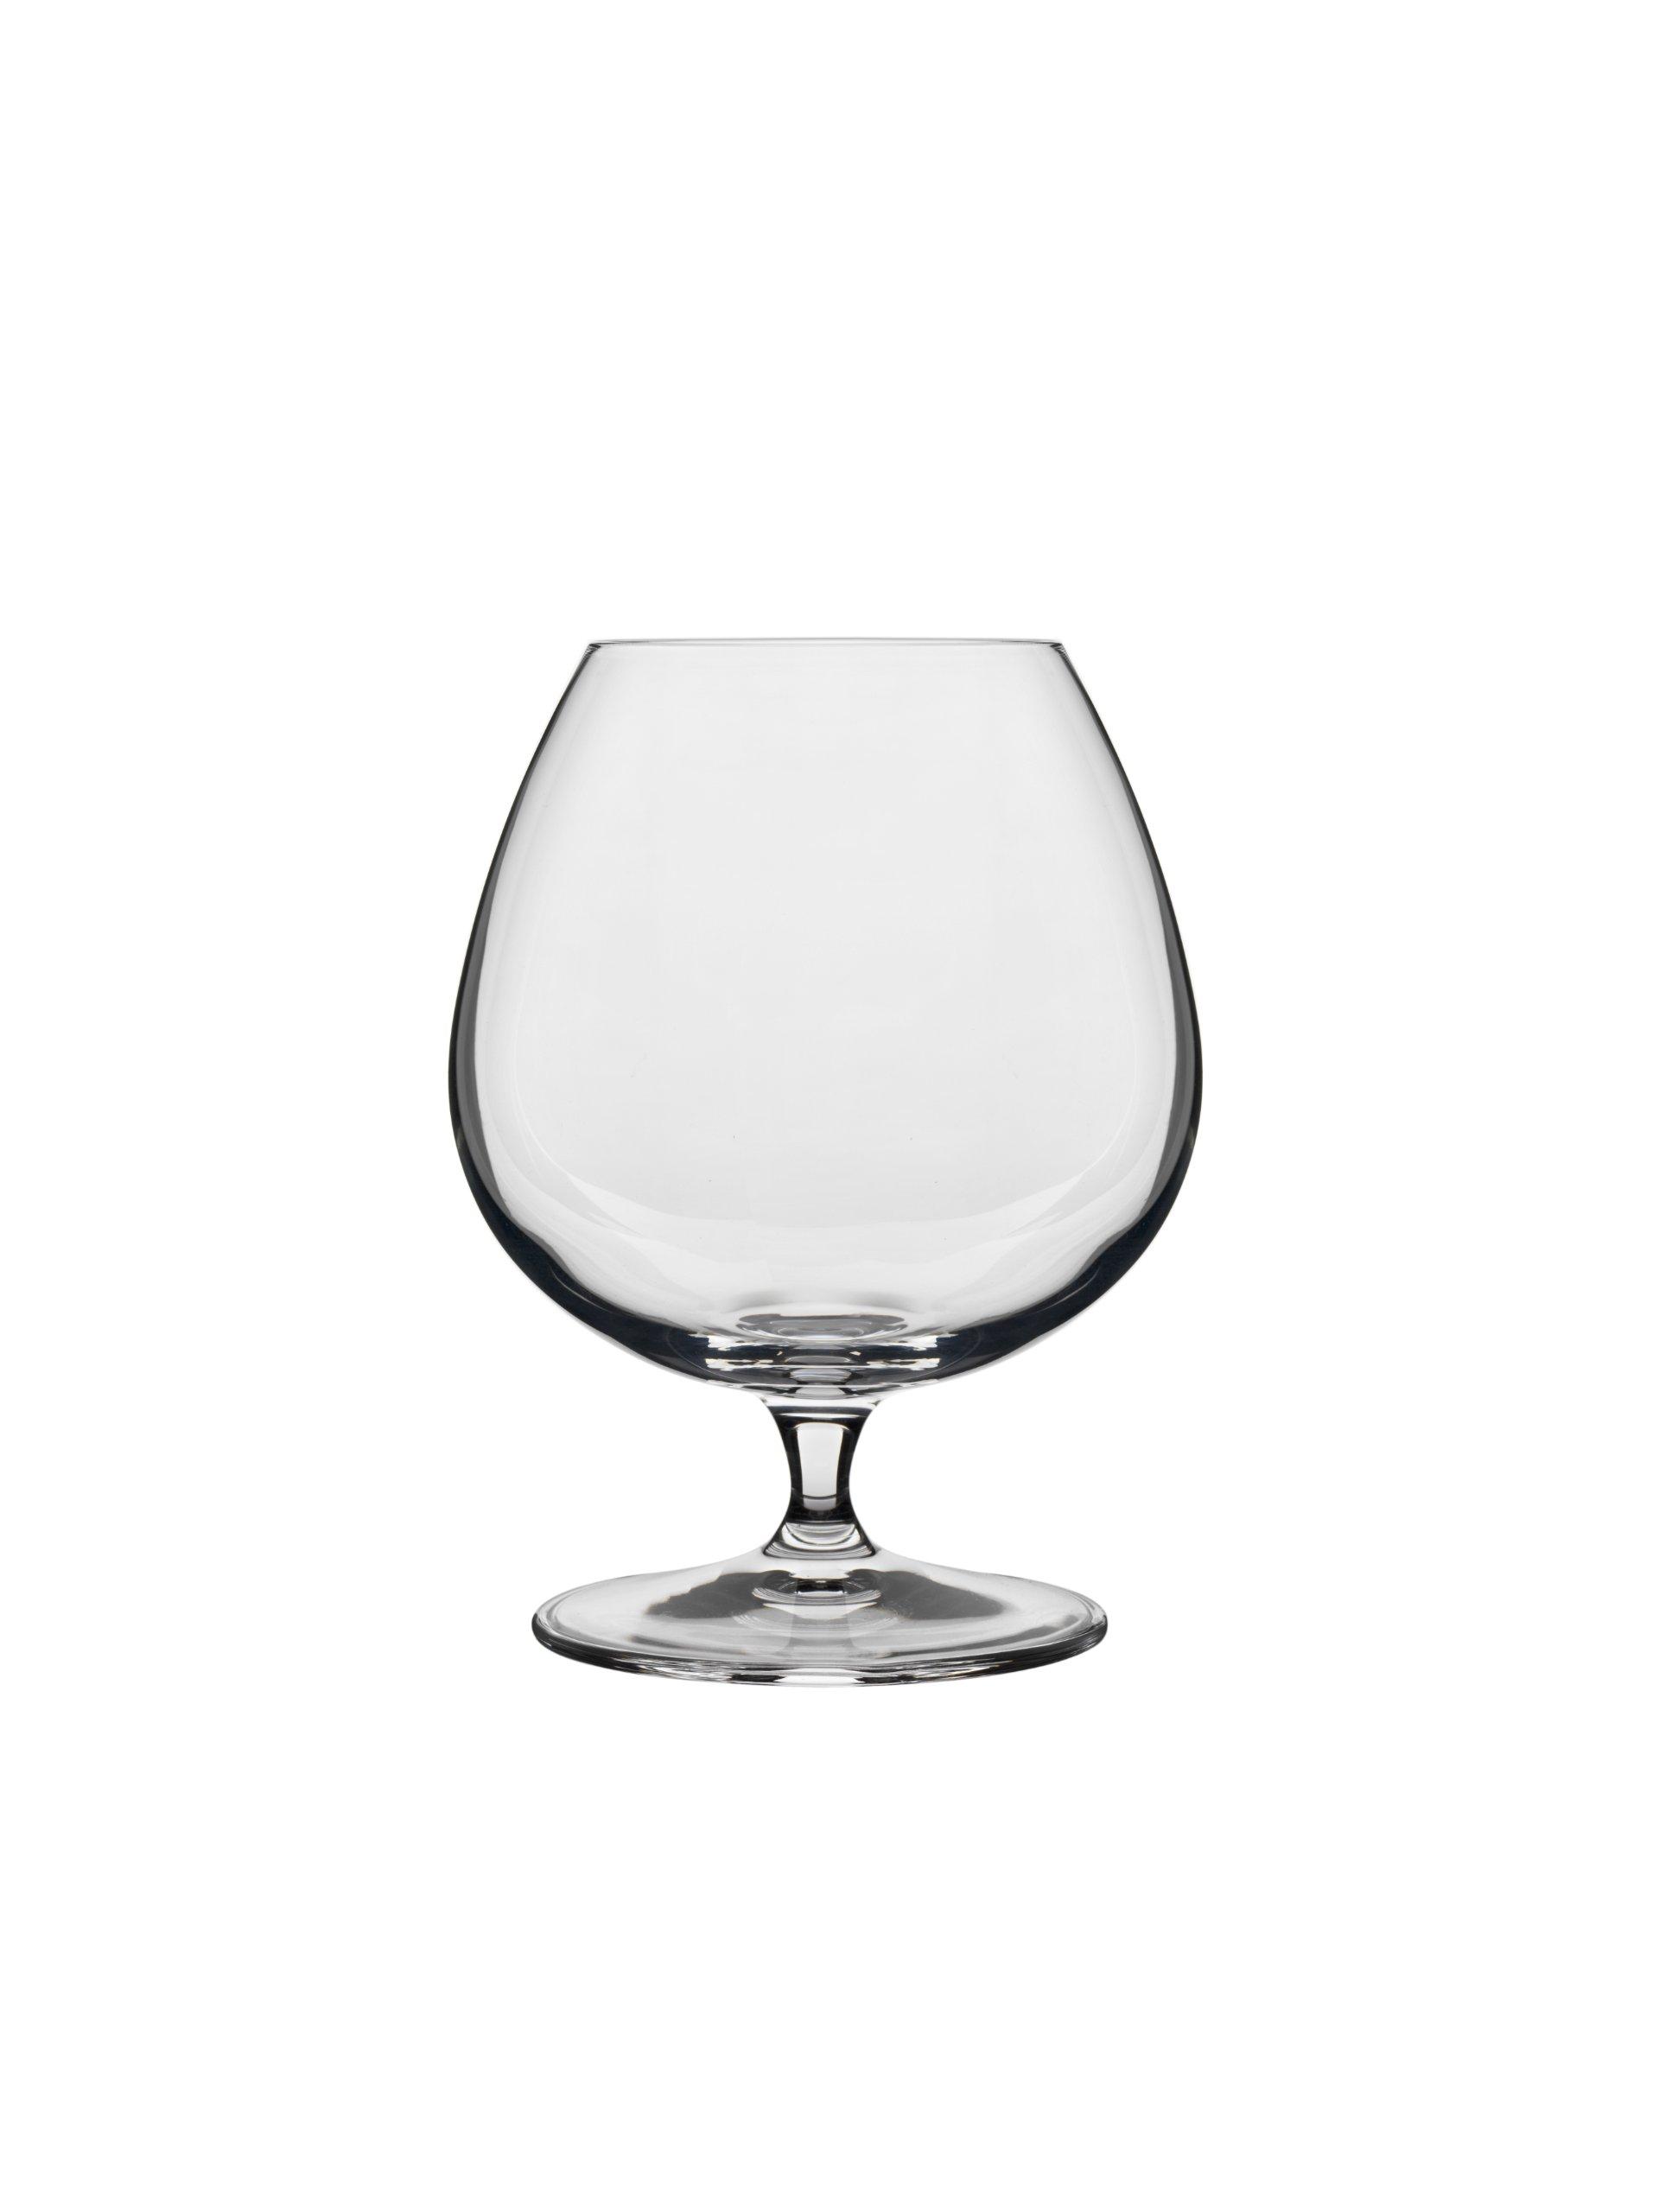 Luigi Bormioli 10564/02 Crescendo 15-1/2-Ounce Brandy Snifter,Clear, Set of 4